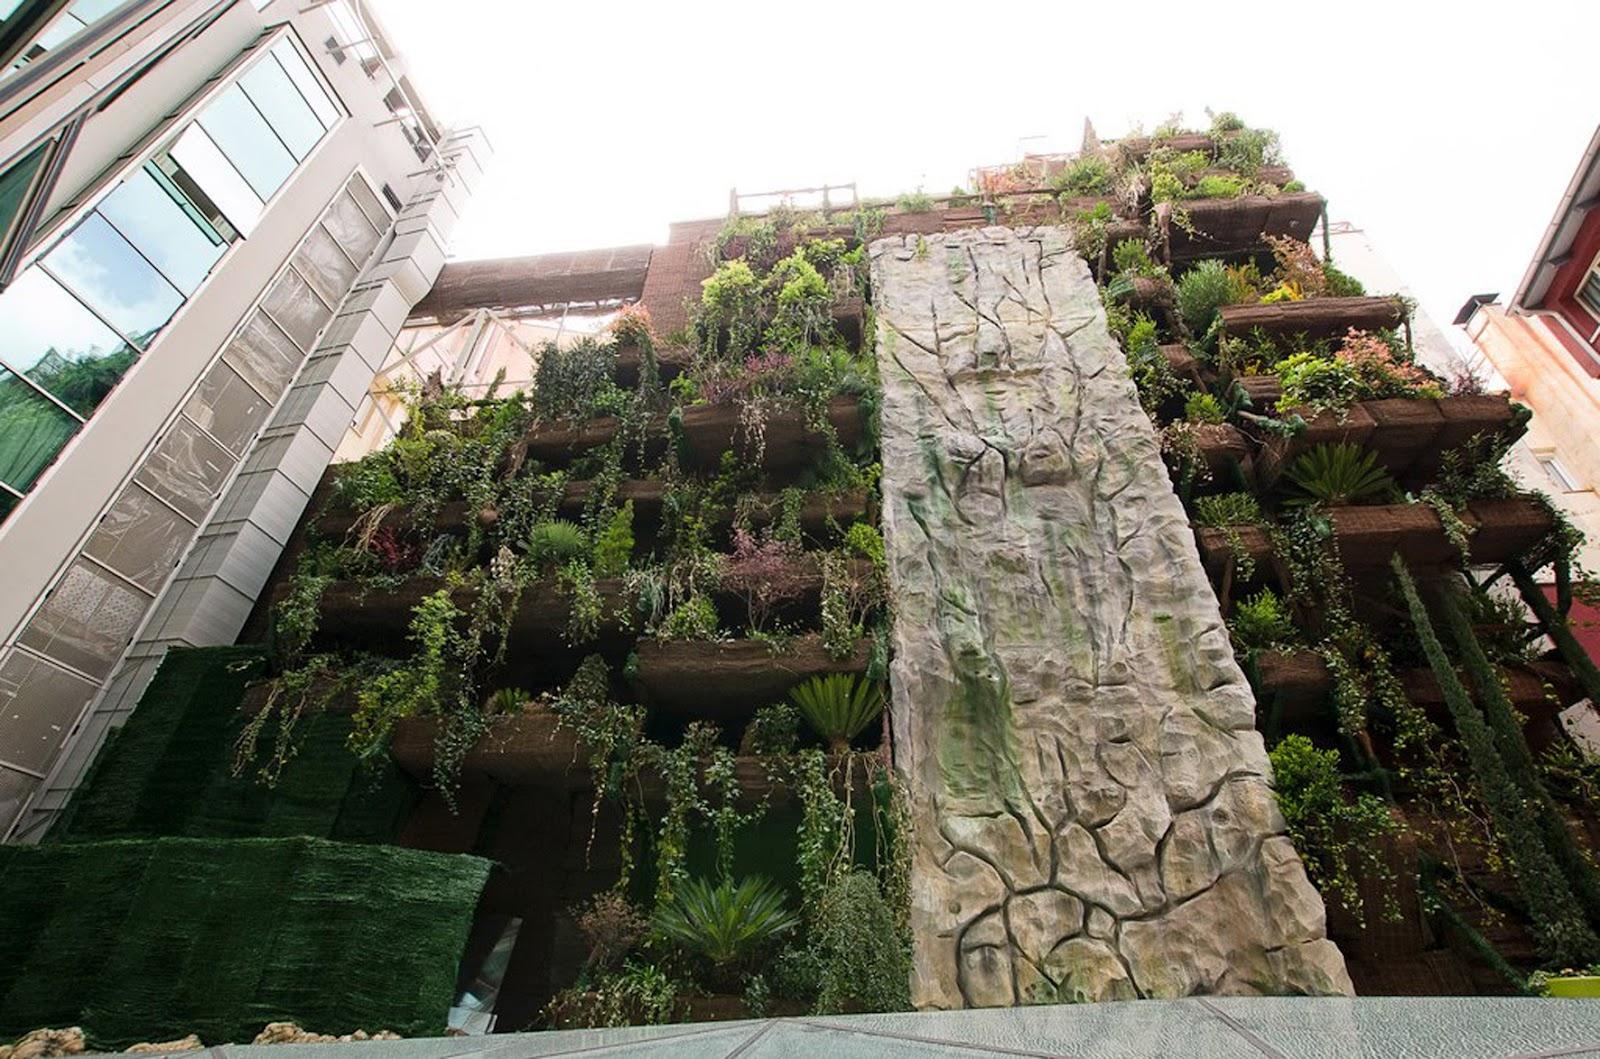 Fandipandi jardines colgantes Hotel jardines de babilonia